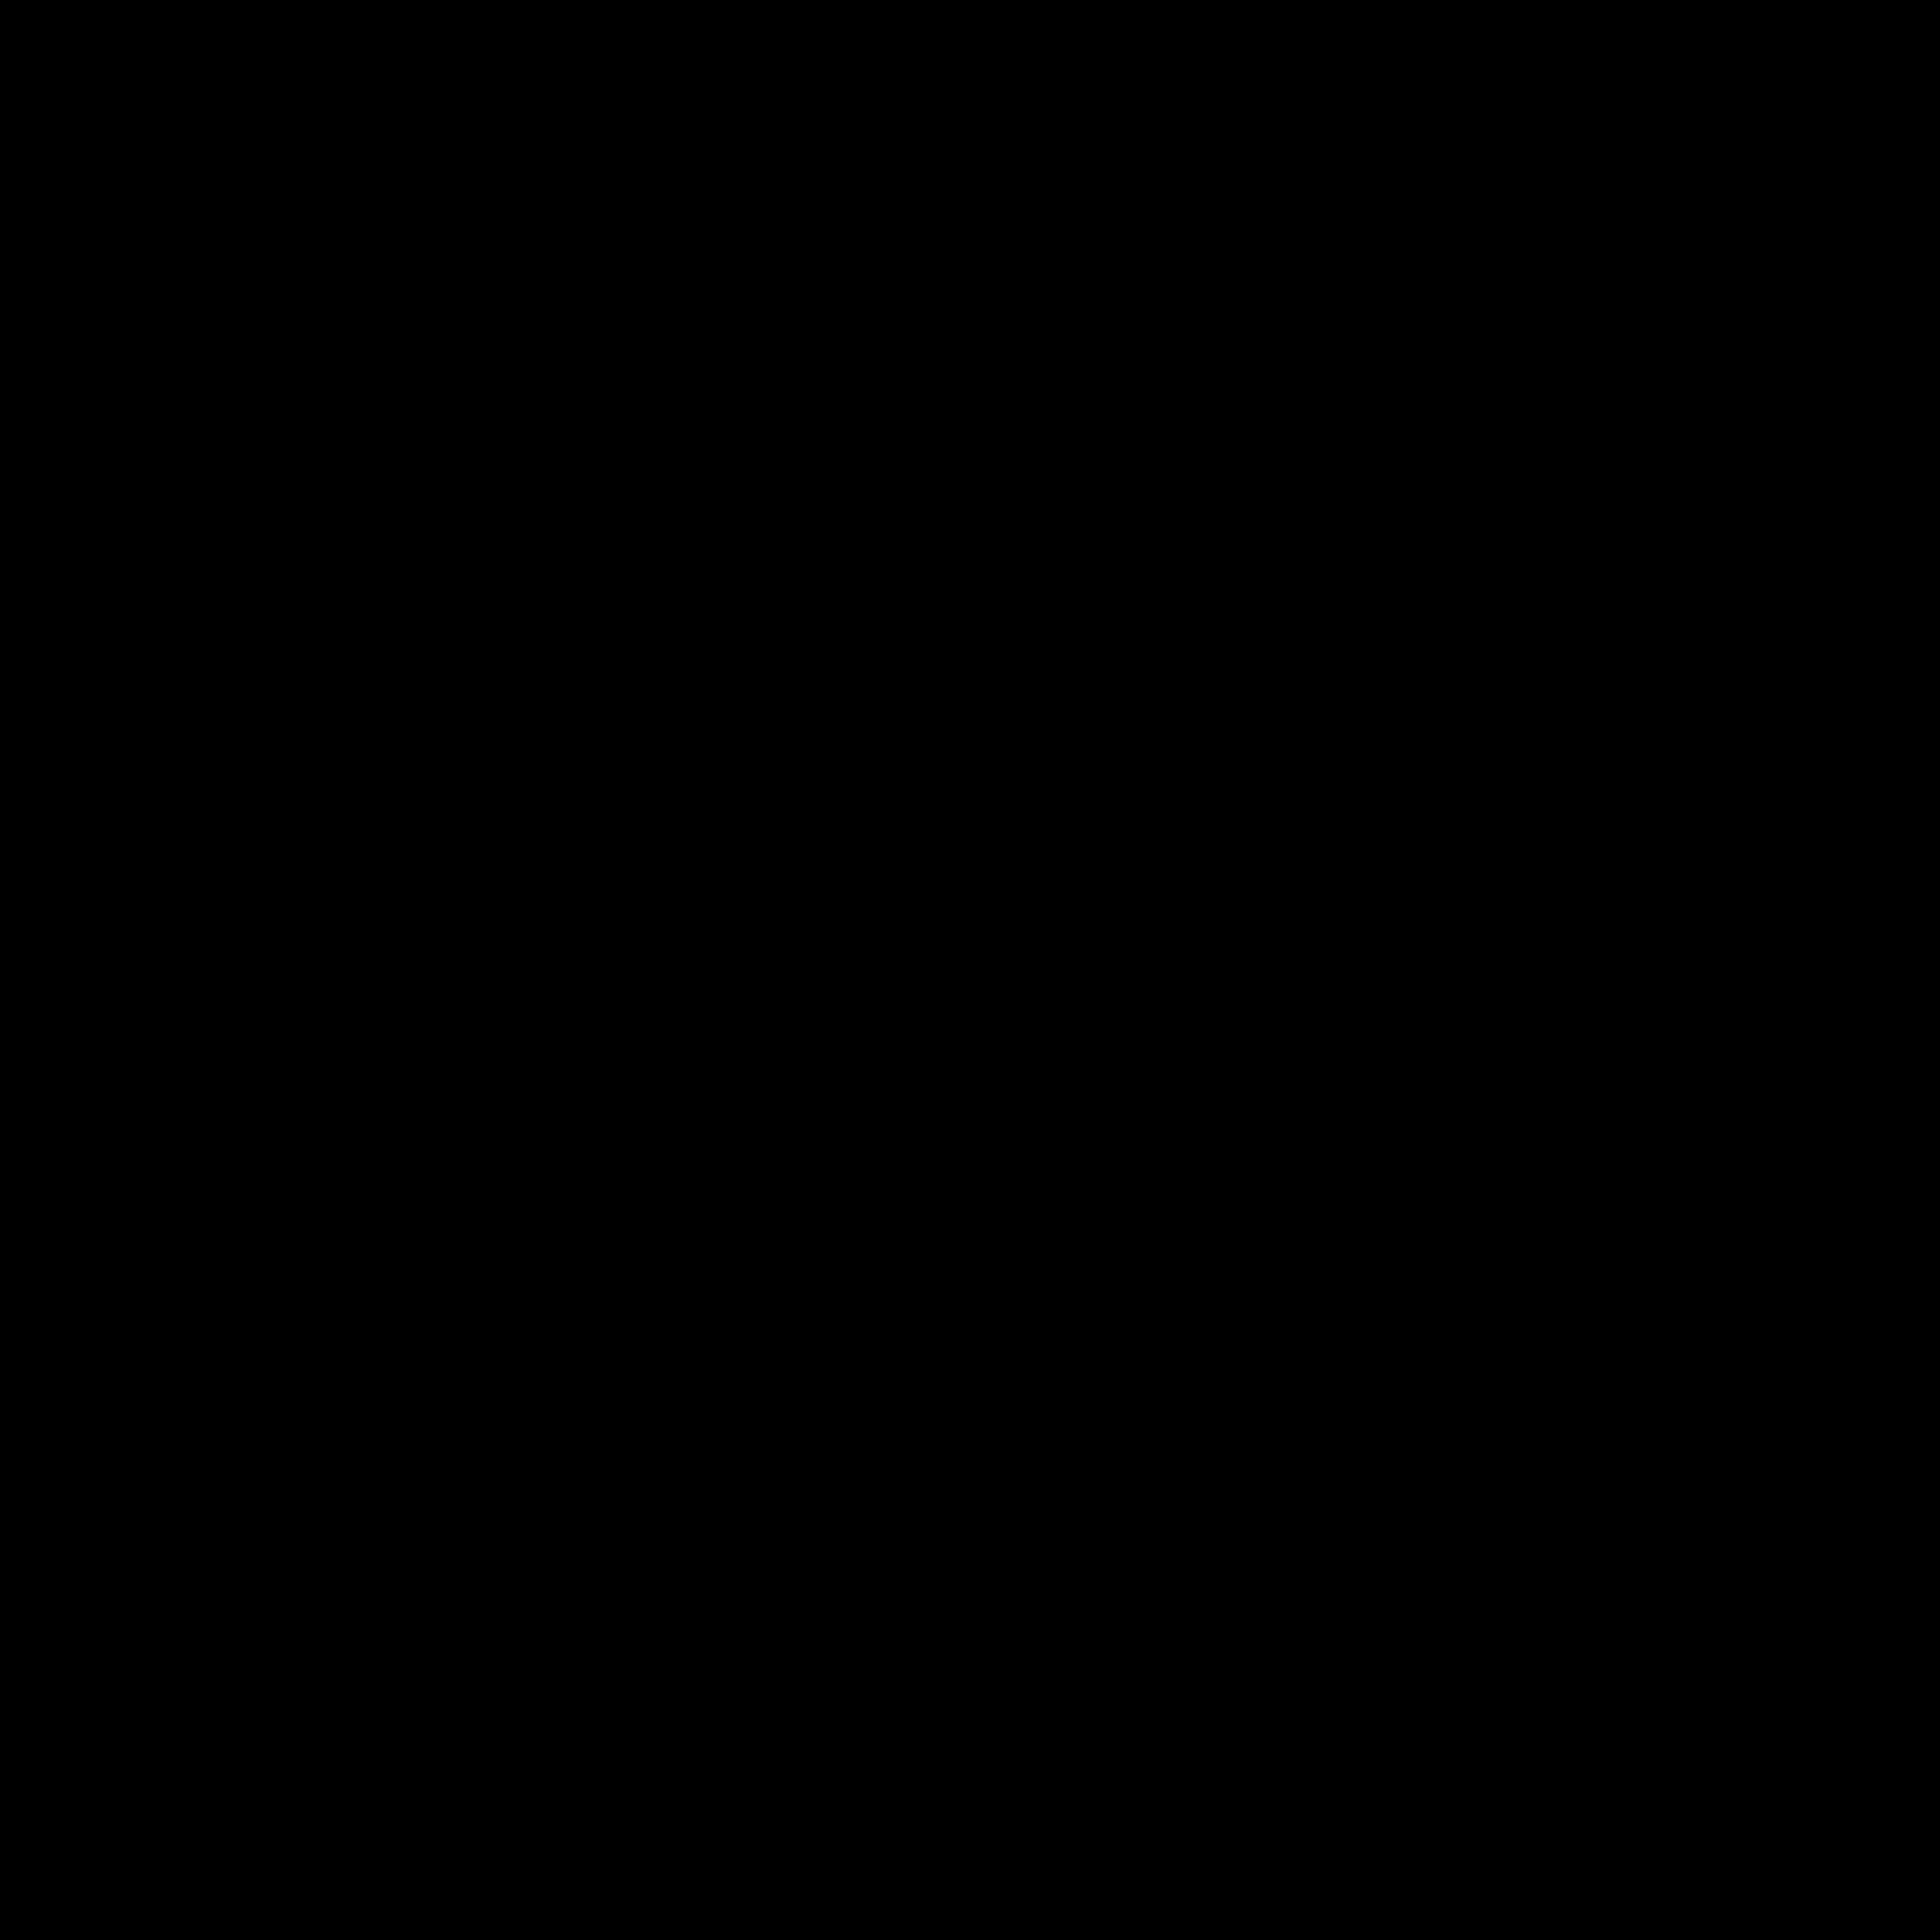 LawAid_Logo_Black_transparent_background